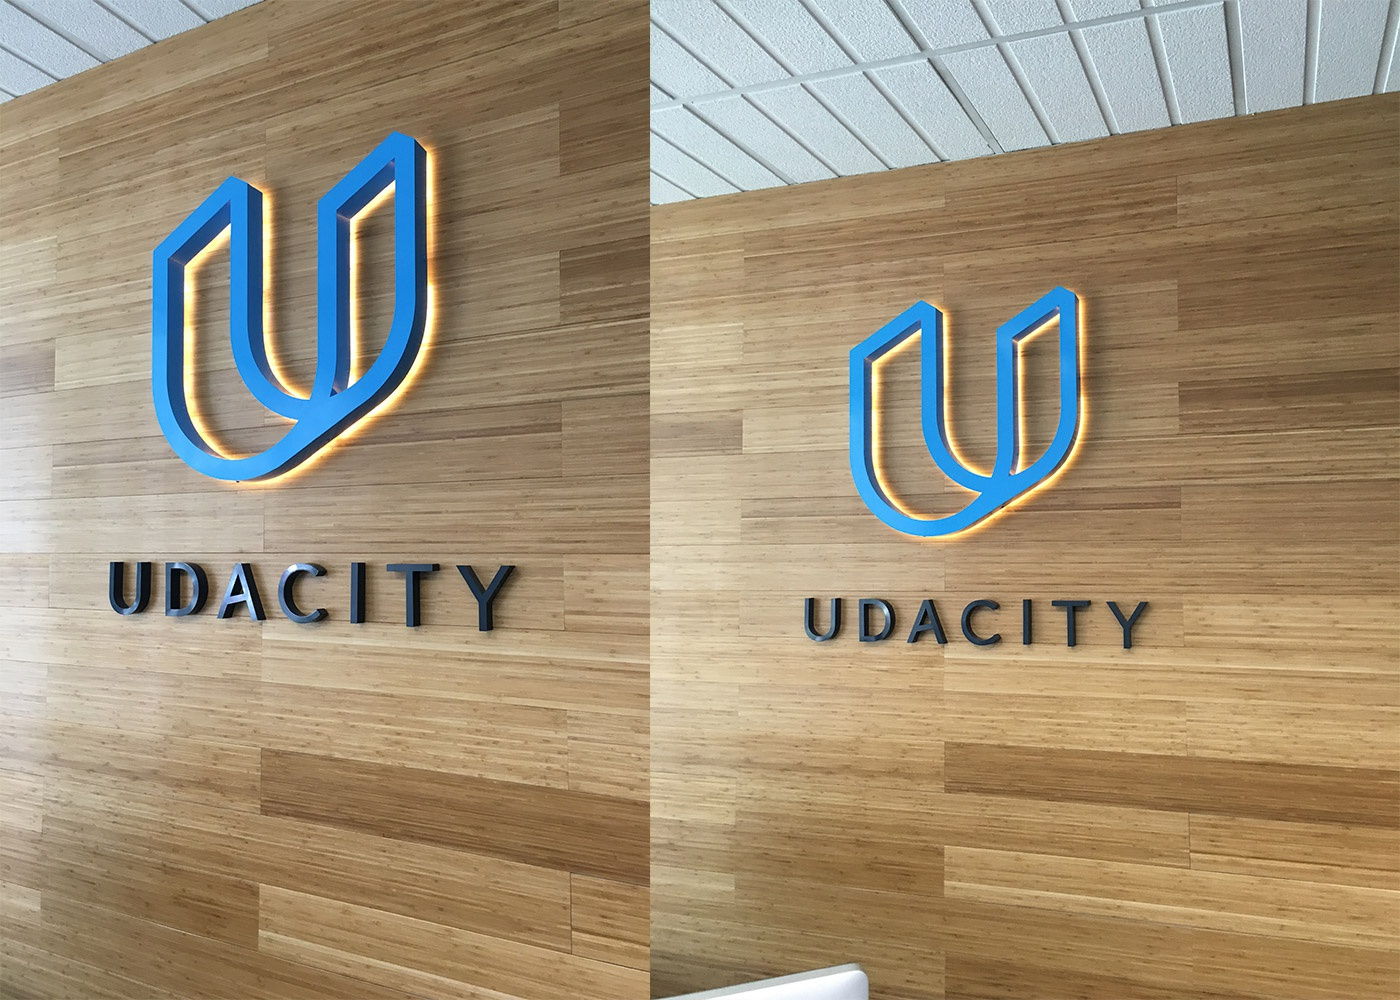 Udacity entry way